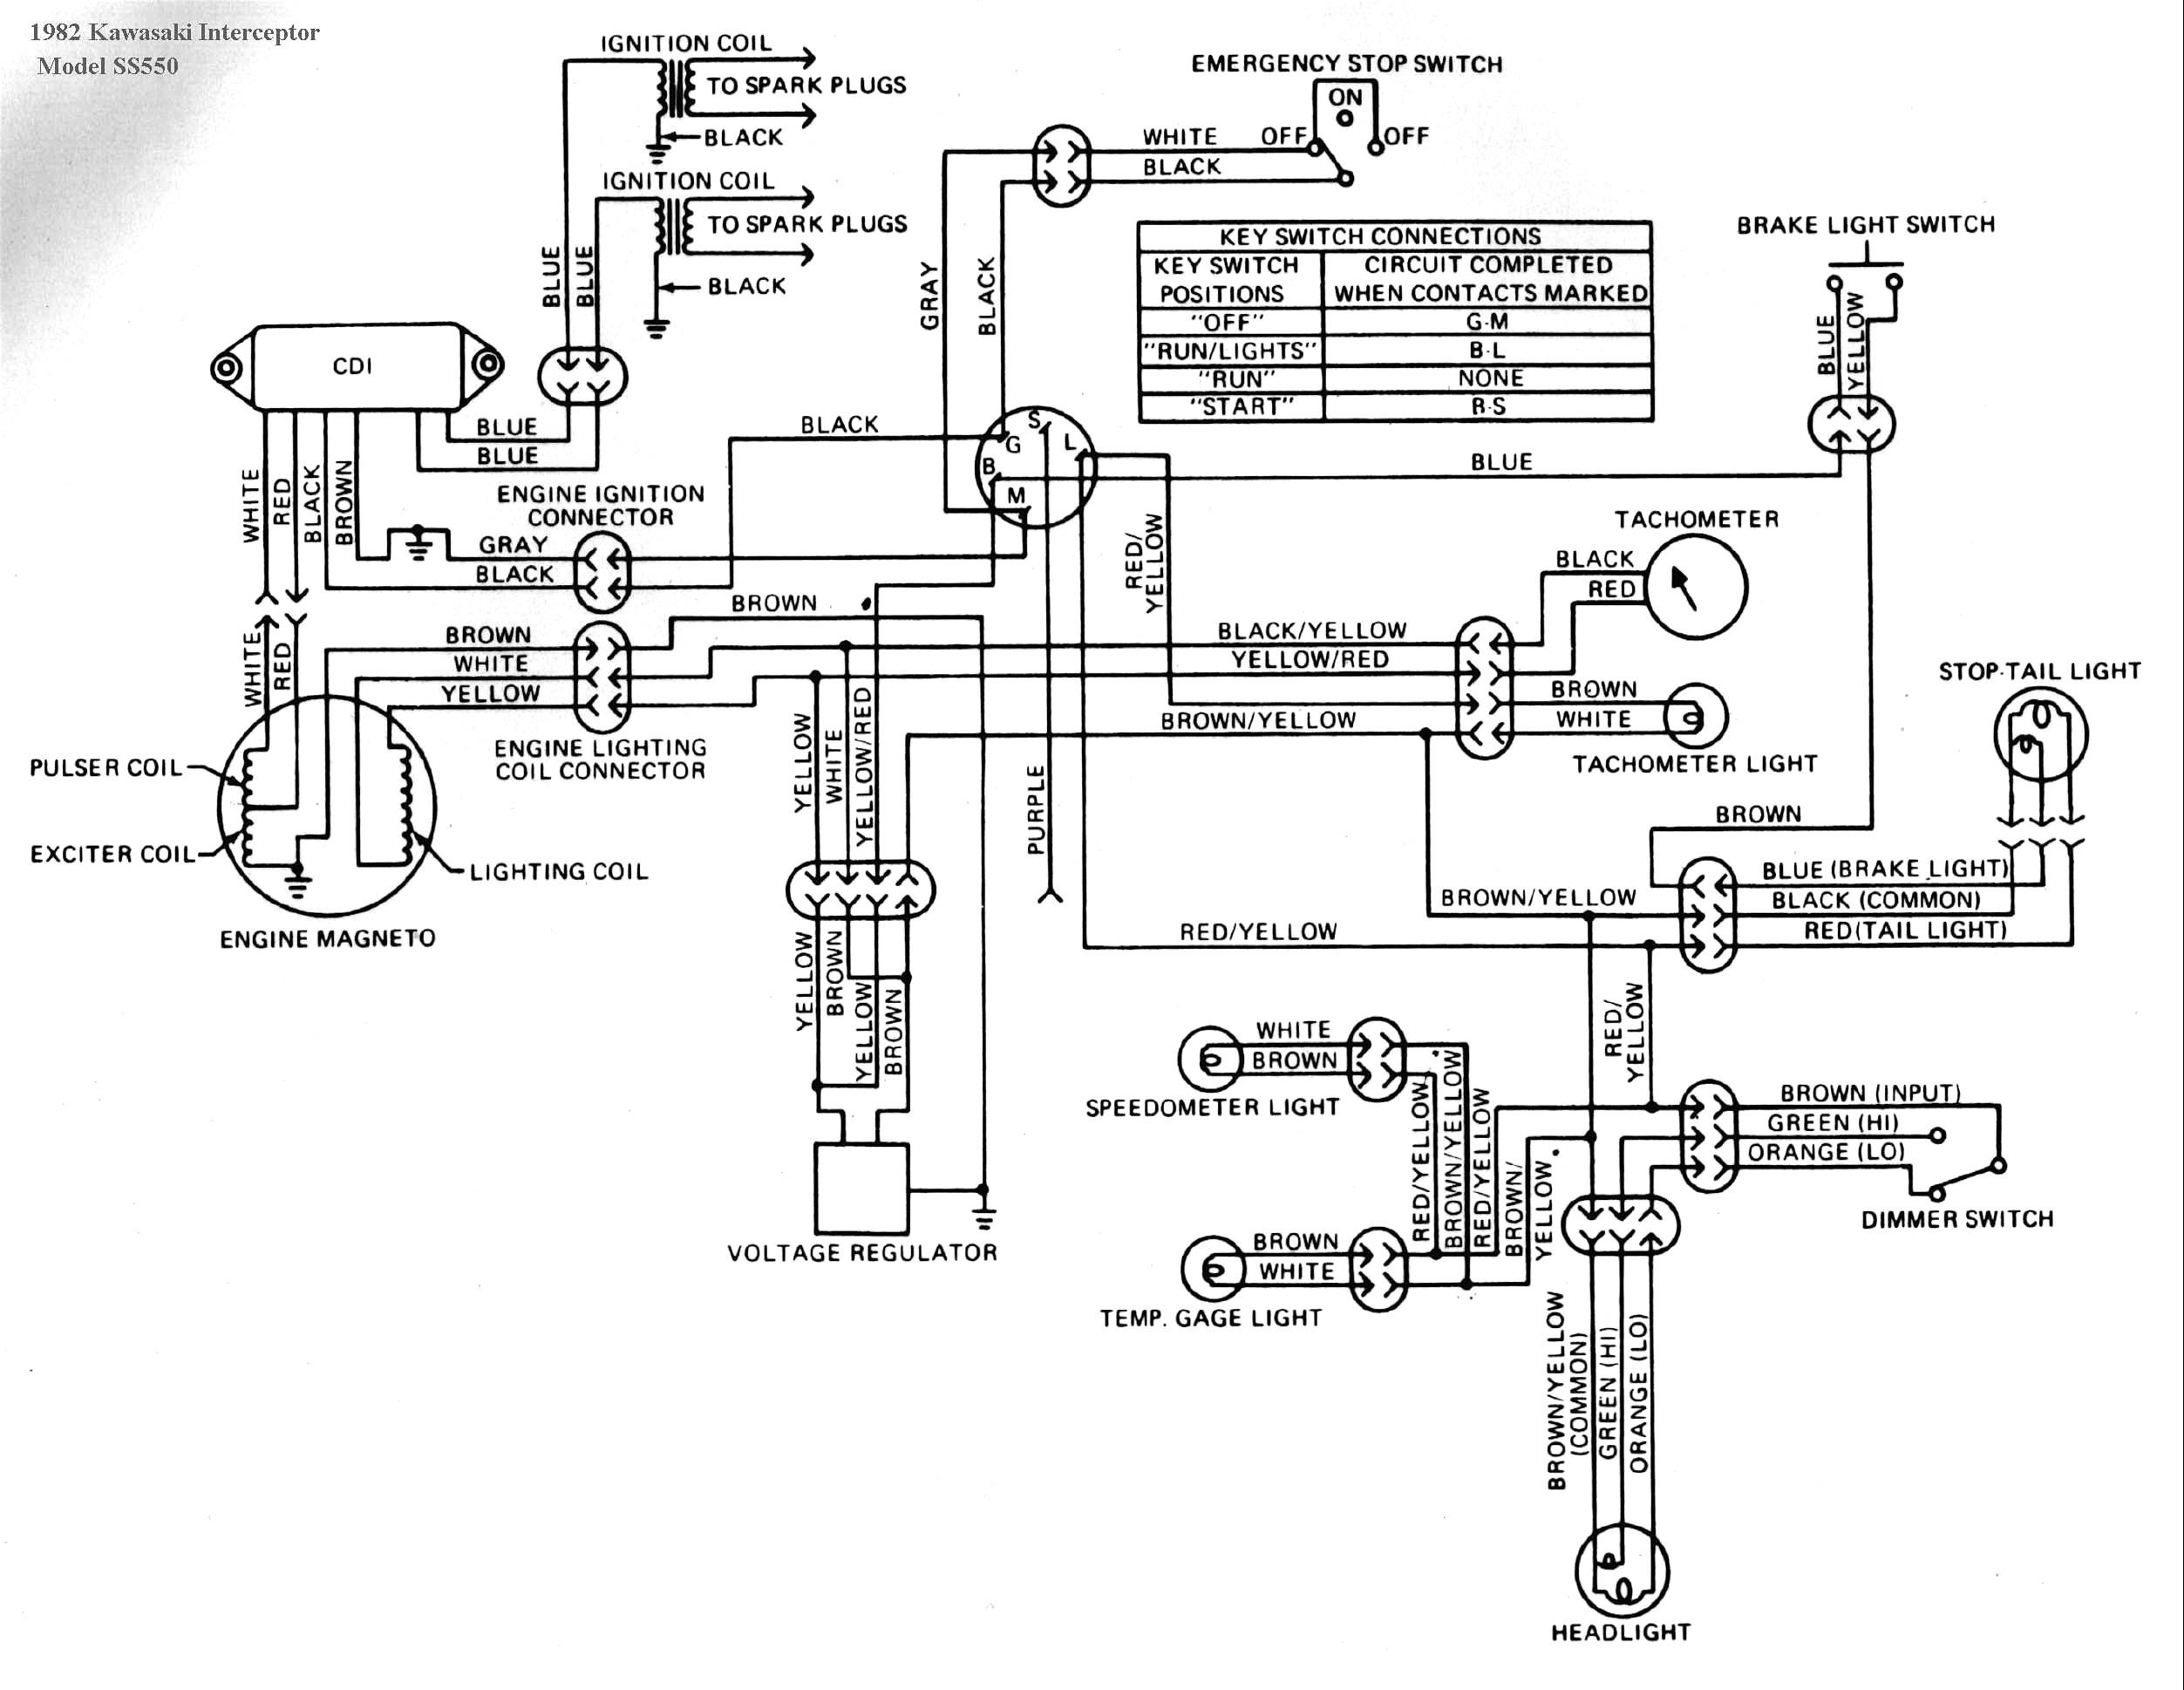 Kawasaki F9 Wiring Diagram | Wiring Diagram 2019 on dodge engine wiring diagrams, 2008 kawasaki wiring diagrams, john deere 425 engine diagrams, caterpillar engine wiring diagrams, kawasaki kx125 wiring diagrams, kawasaki electrical diagrams, kawasaki engine fuel pump location, large john deere engine diagrams, kawasaki carburetor diagrams, kawasaki ninja wiring diagrams, john deere parts diagrams, kawasaki motorcycle wiring diagrams, 1982 kawasaki wiring diagrams, kawasaki clutch diagrams, john deere tractor engine diagrams, small engine wiring diagrams, kawasaki engine oil filters, kawasaki prairie 300 4x4, kohler engine wiring diagrams, easy diagrams,